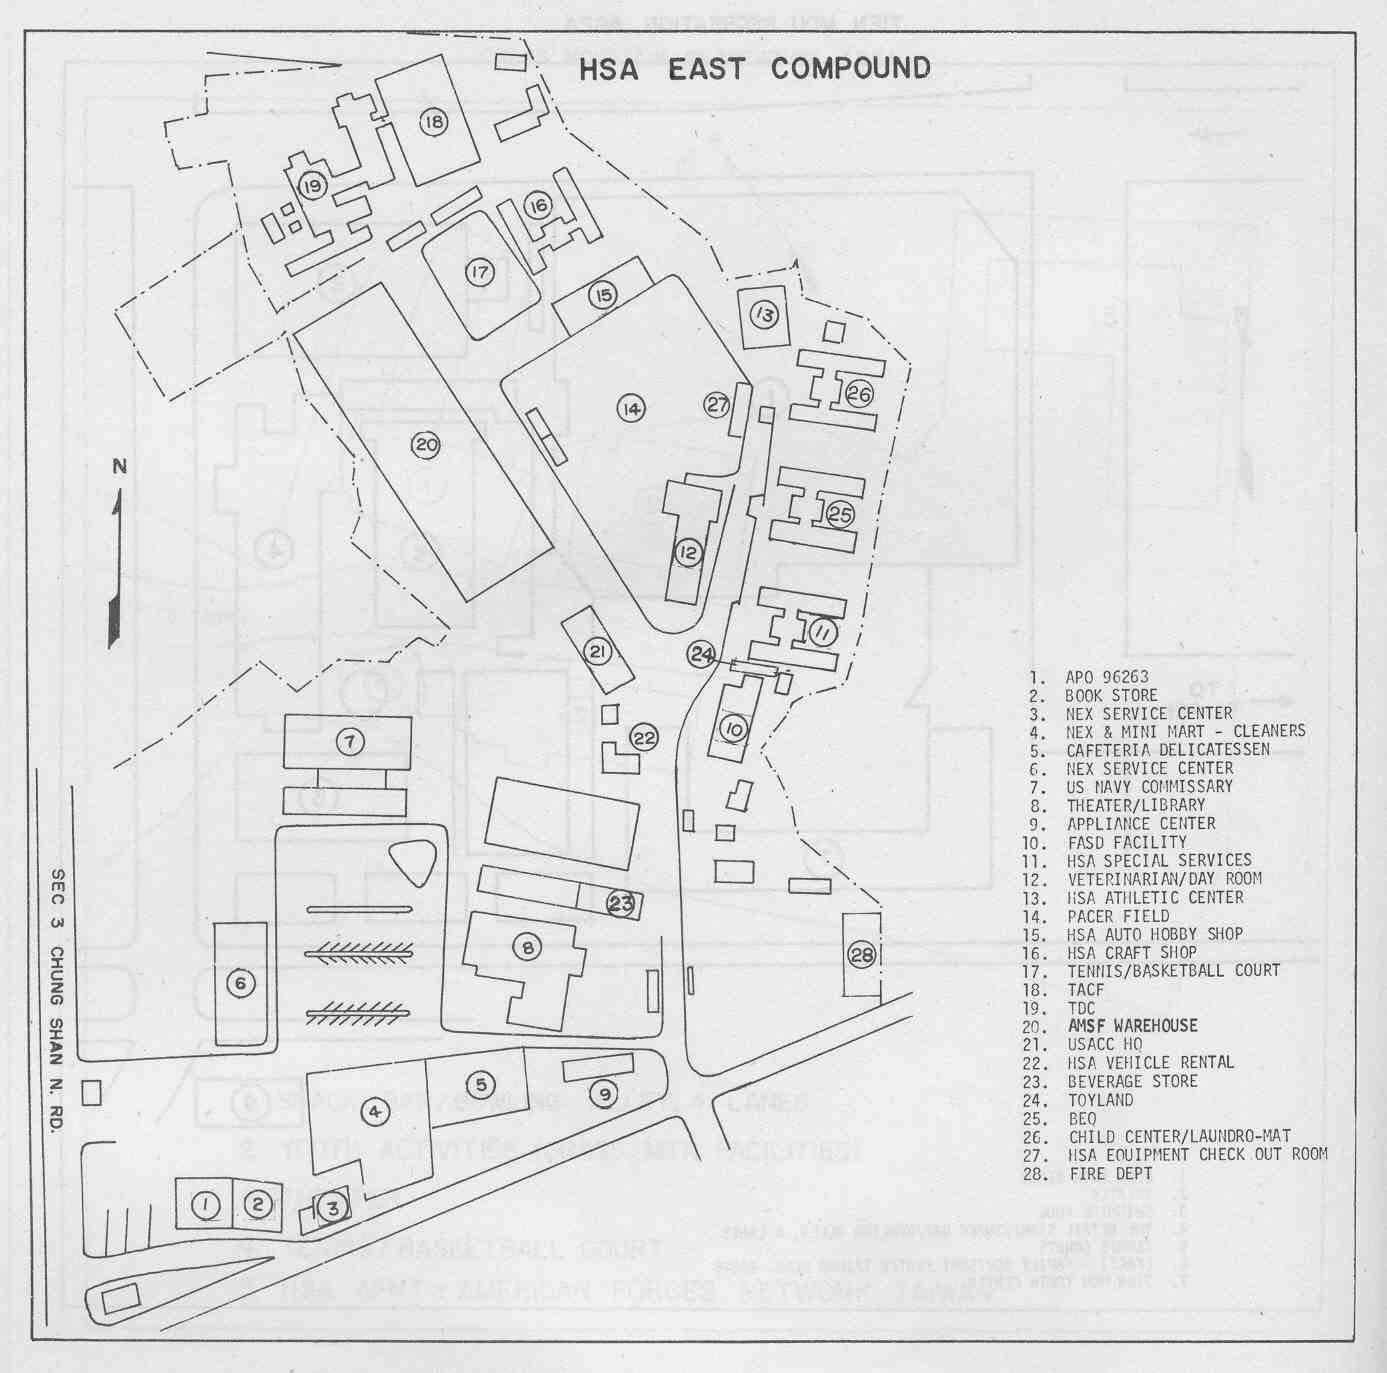 [HSA_East_Compound1977.jpg]